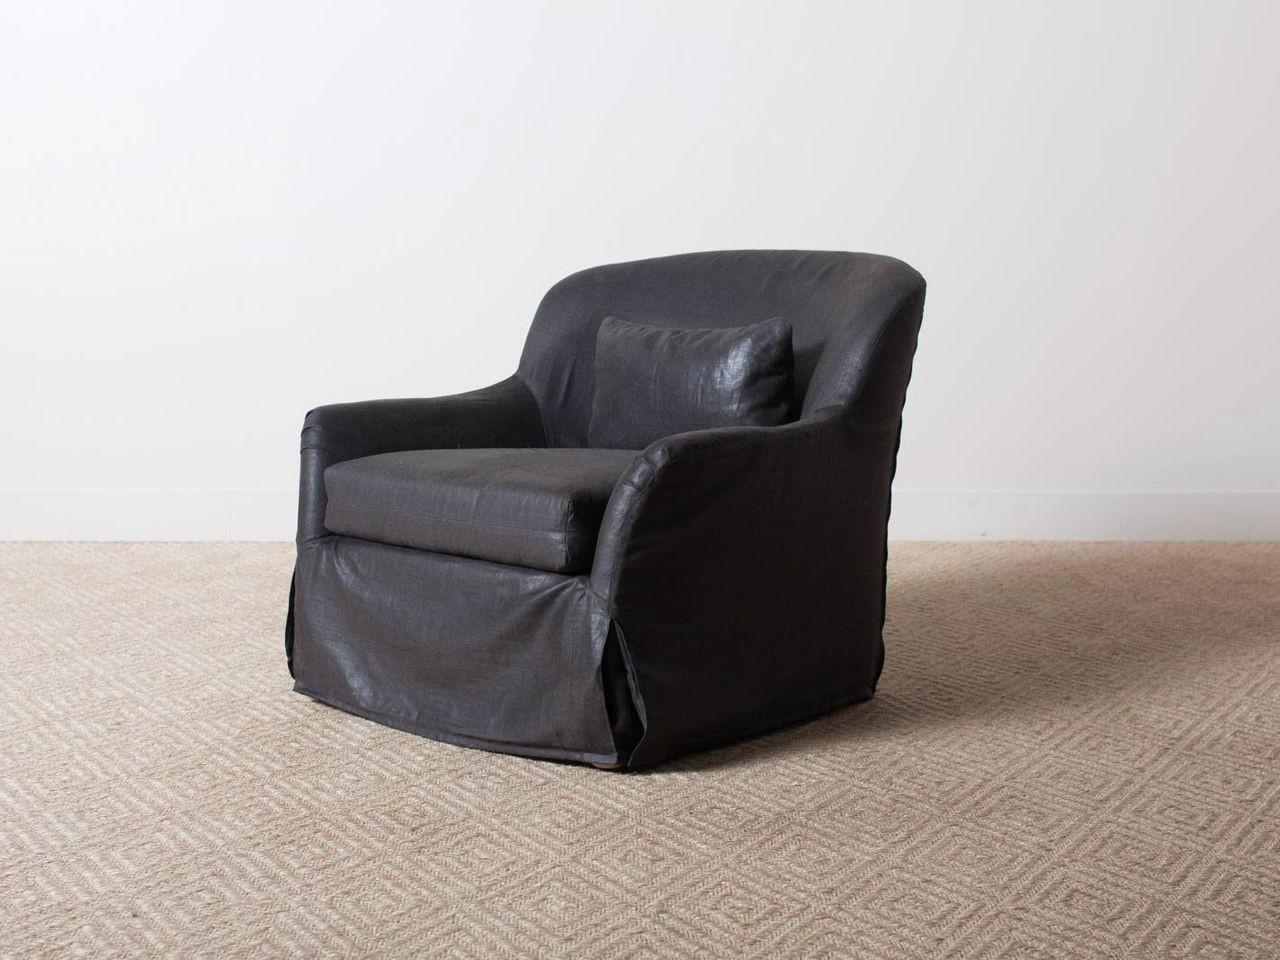 barrel back chair target gaming chairs r e v i a l